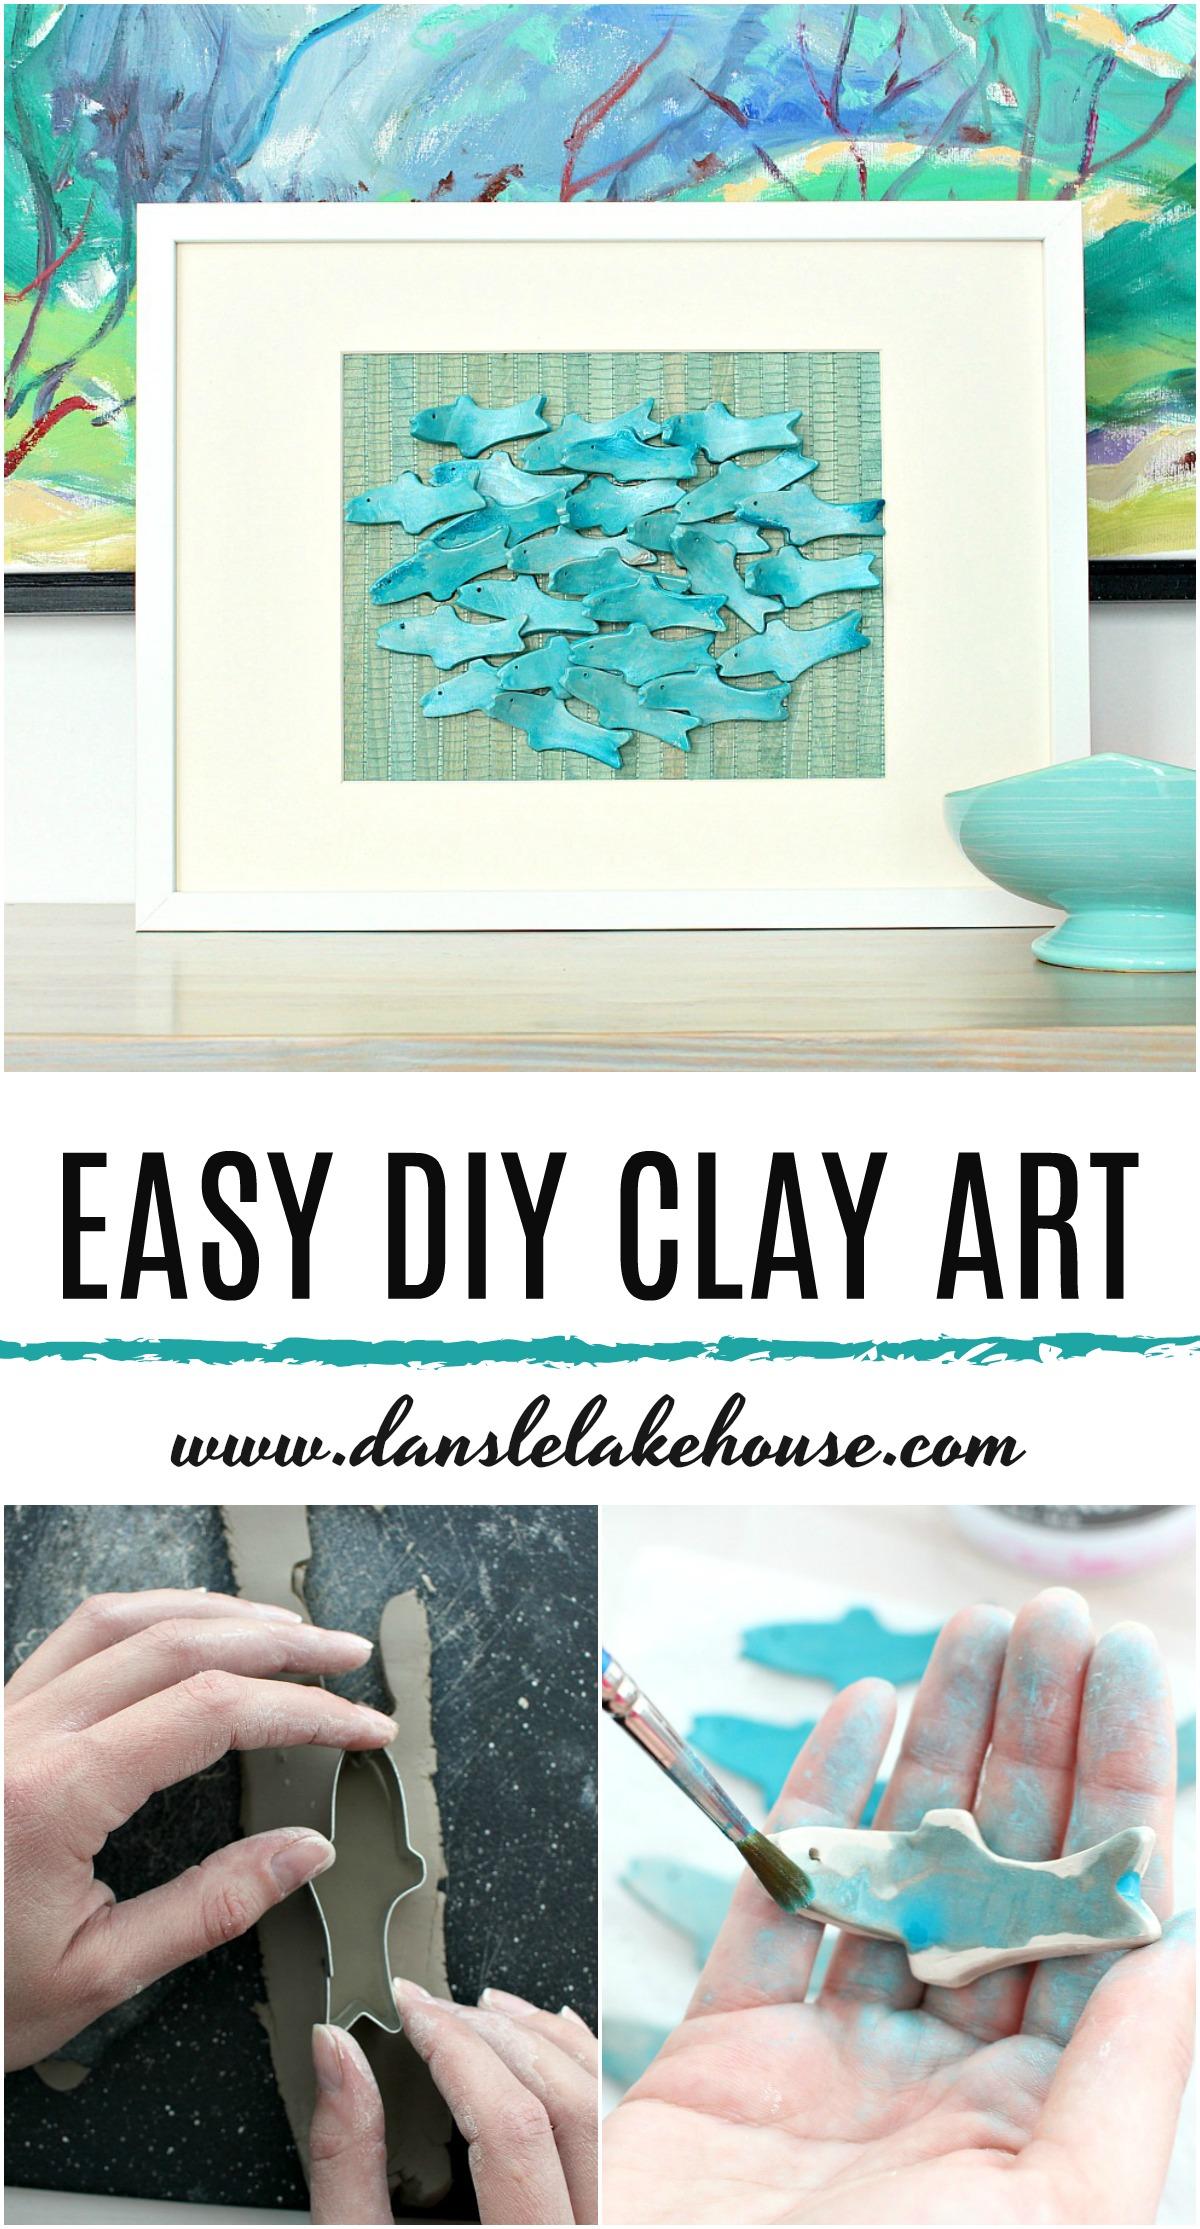 Easy DIY Clay Art. Cute Air Dry Clay Craft Project Idea: Sculptural 3D Fish Art with a Modern Coastal Style. #diyart #airdryclay #diyclay #clay #fish #moderncoastal